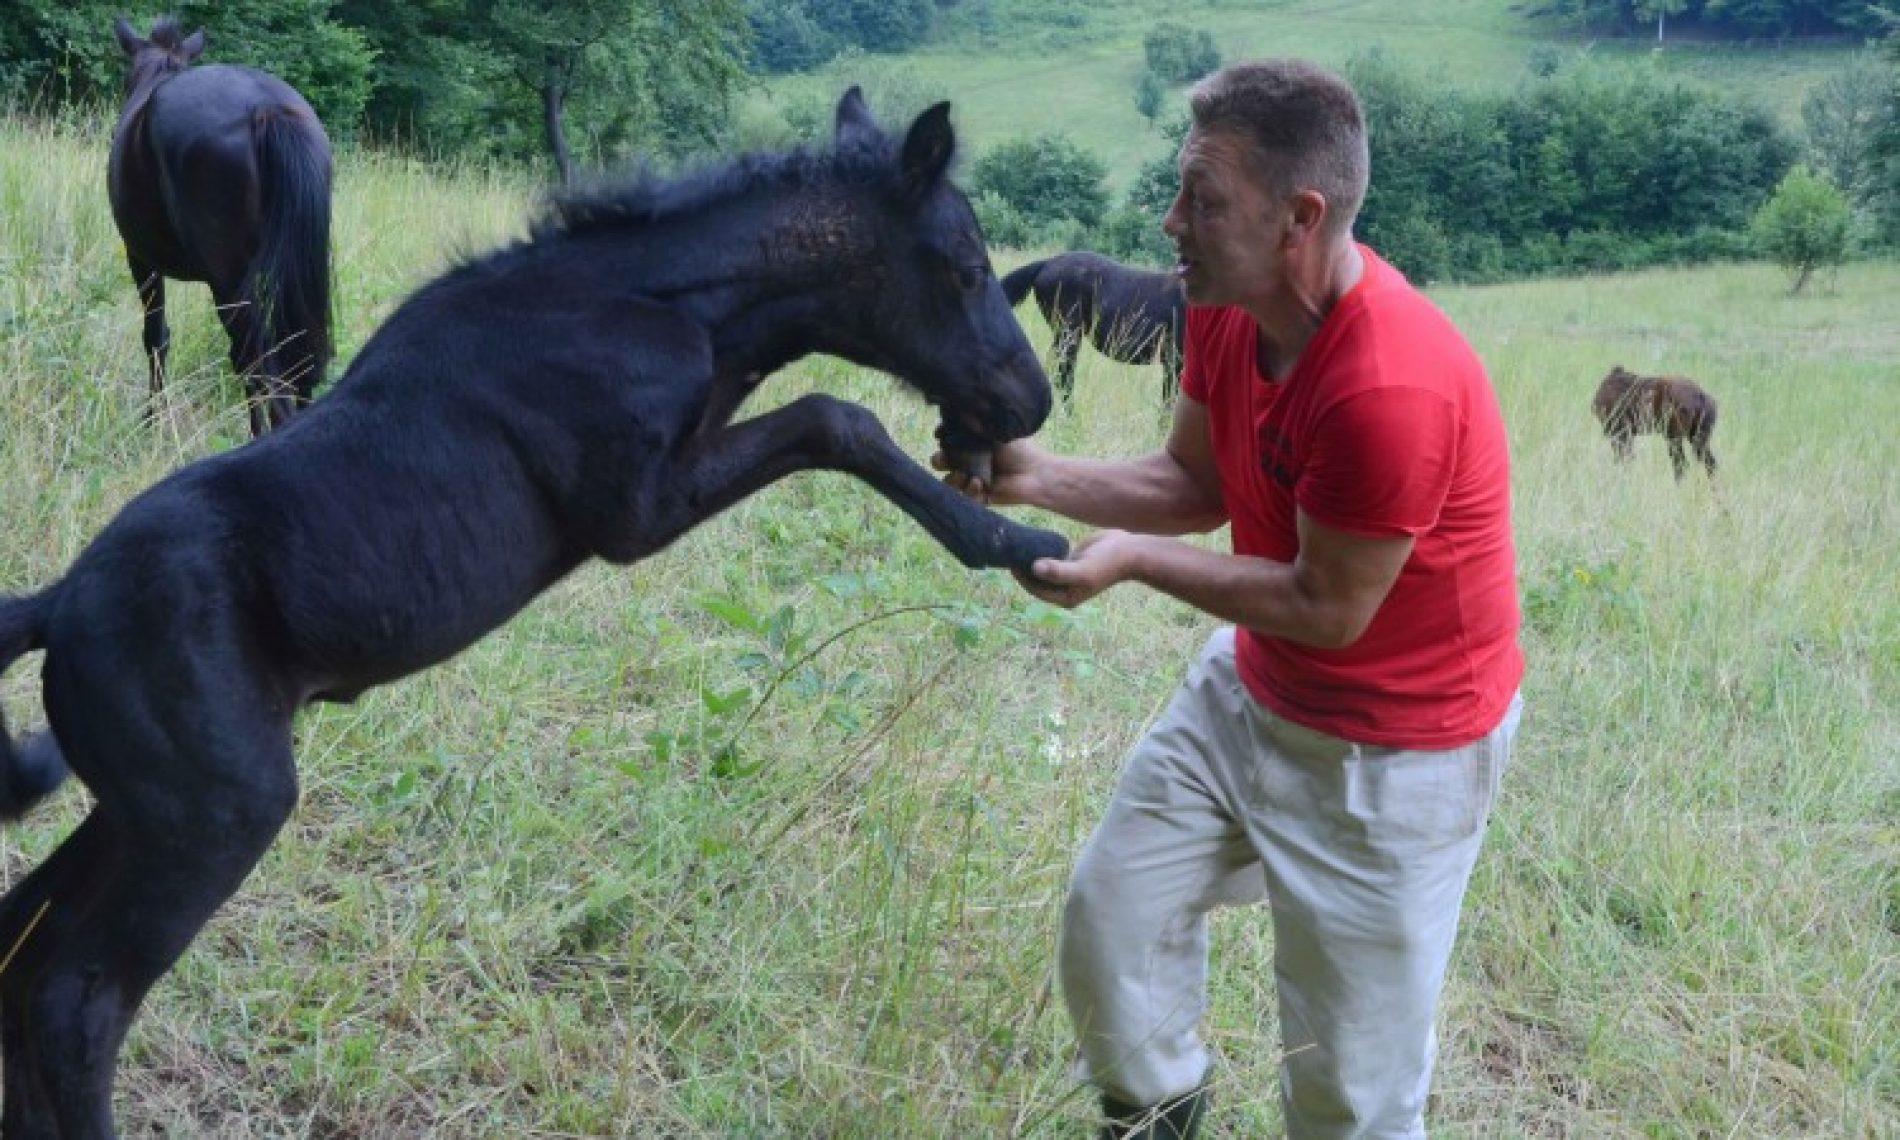 Raste interes za plemenitu pasminu bosanskog brdskog konja (FOTO)